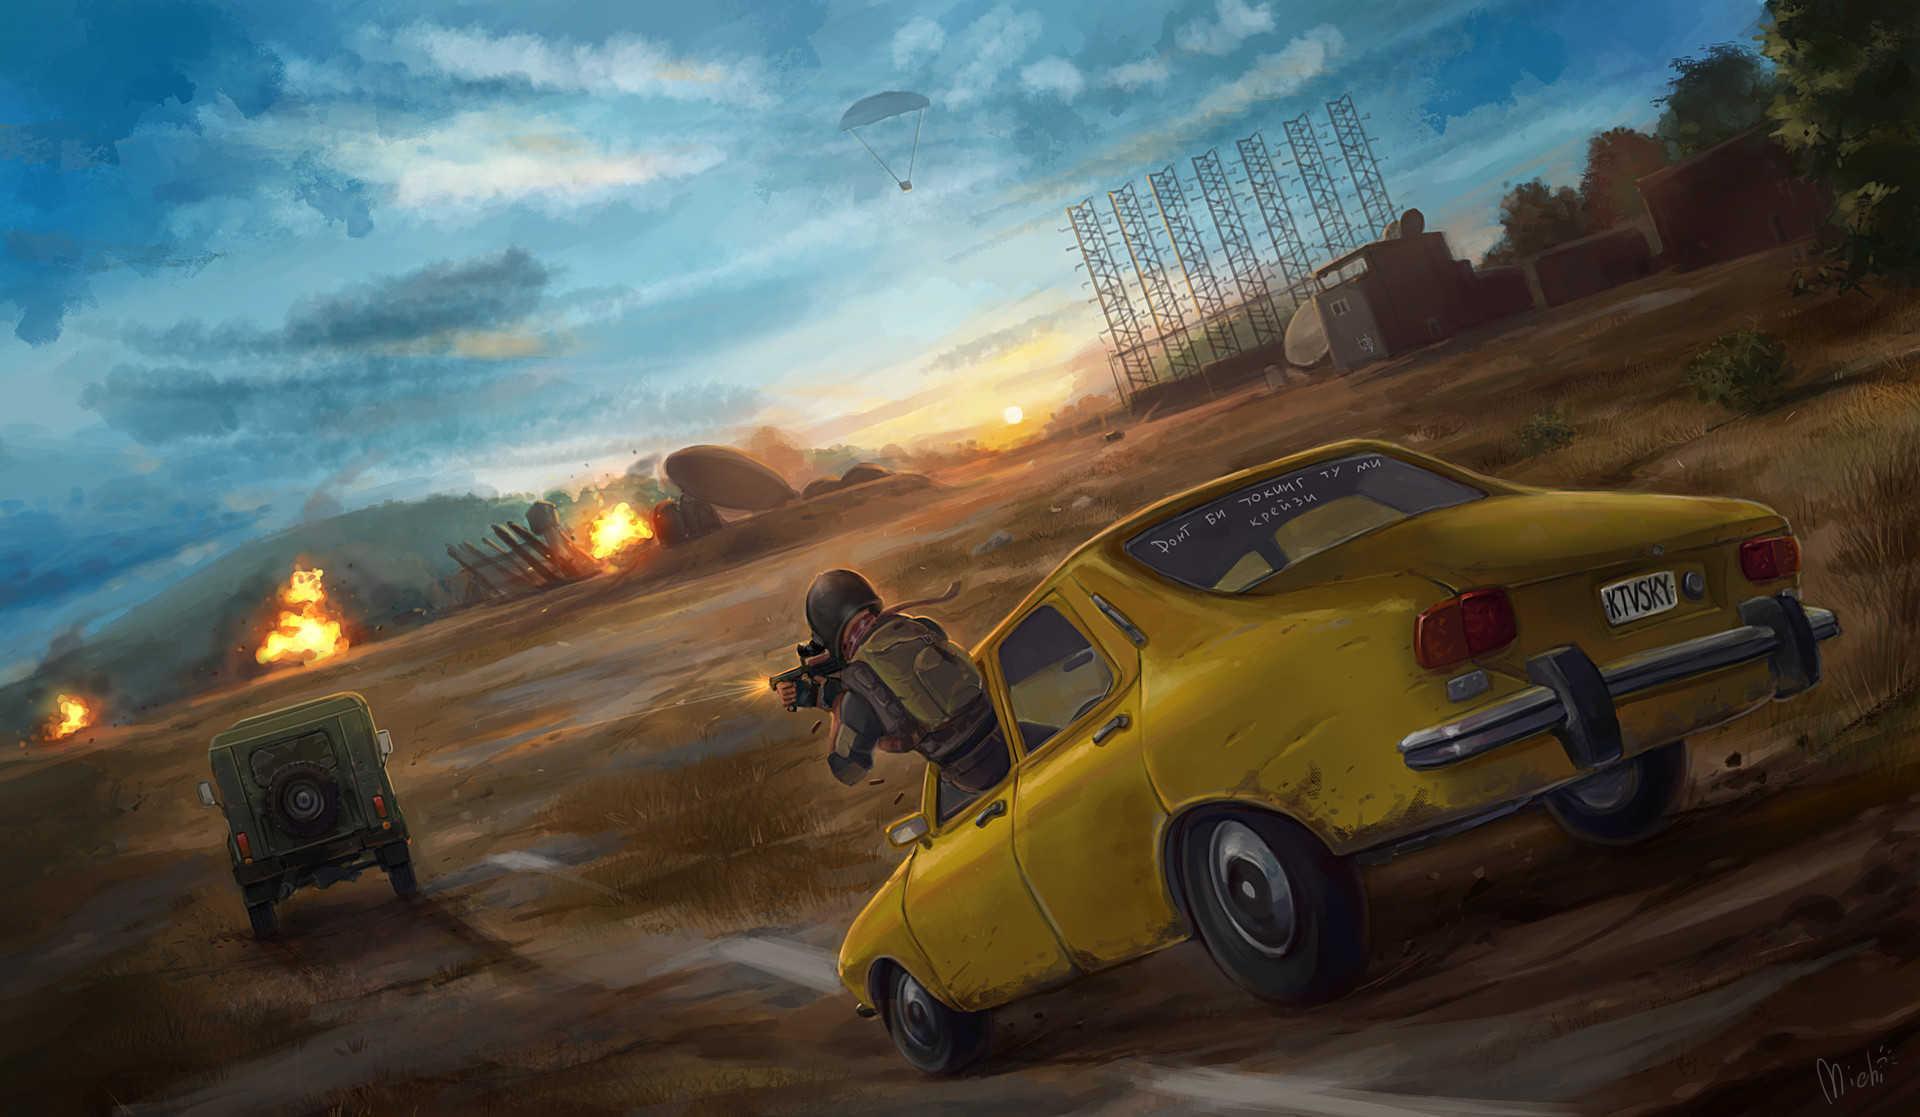 Video Game Playerunknown's Battlegrounds Battlegrounds Hd Wallpaper _ Background Ima_0211 Playerunknown's